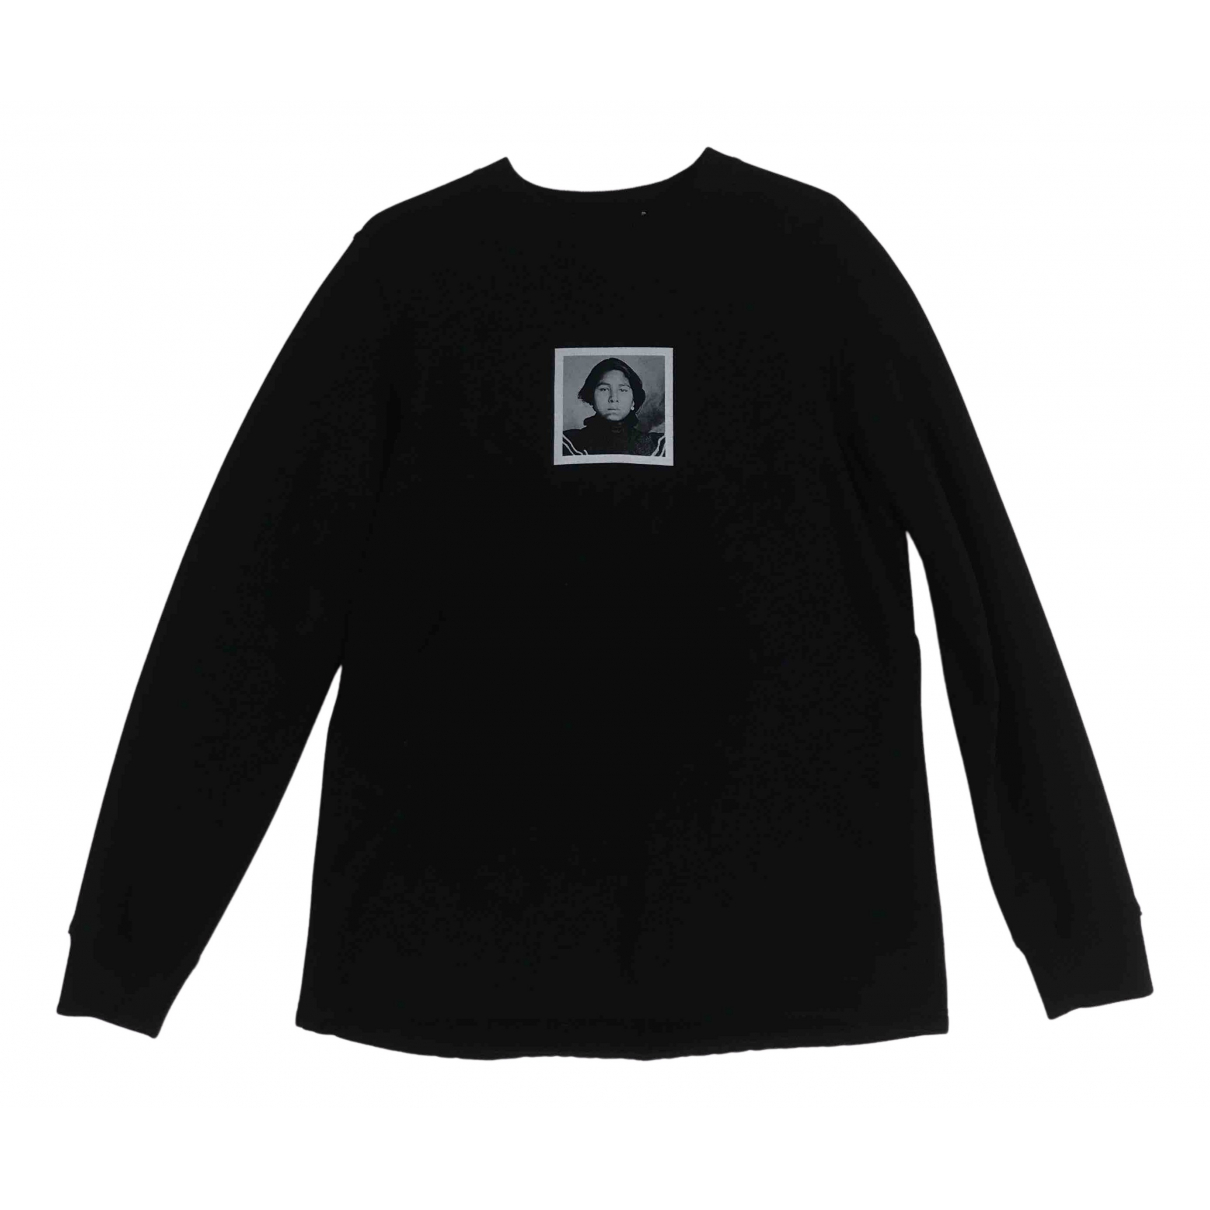 Givenchy N Black Cotton Knitwear & Sweatshirts for Men S International